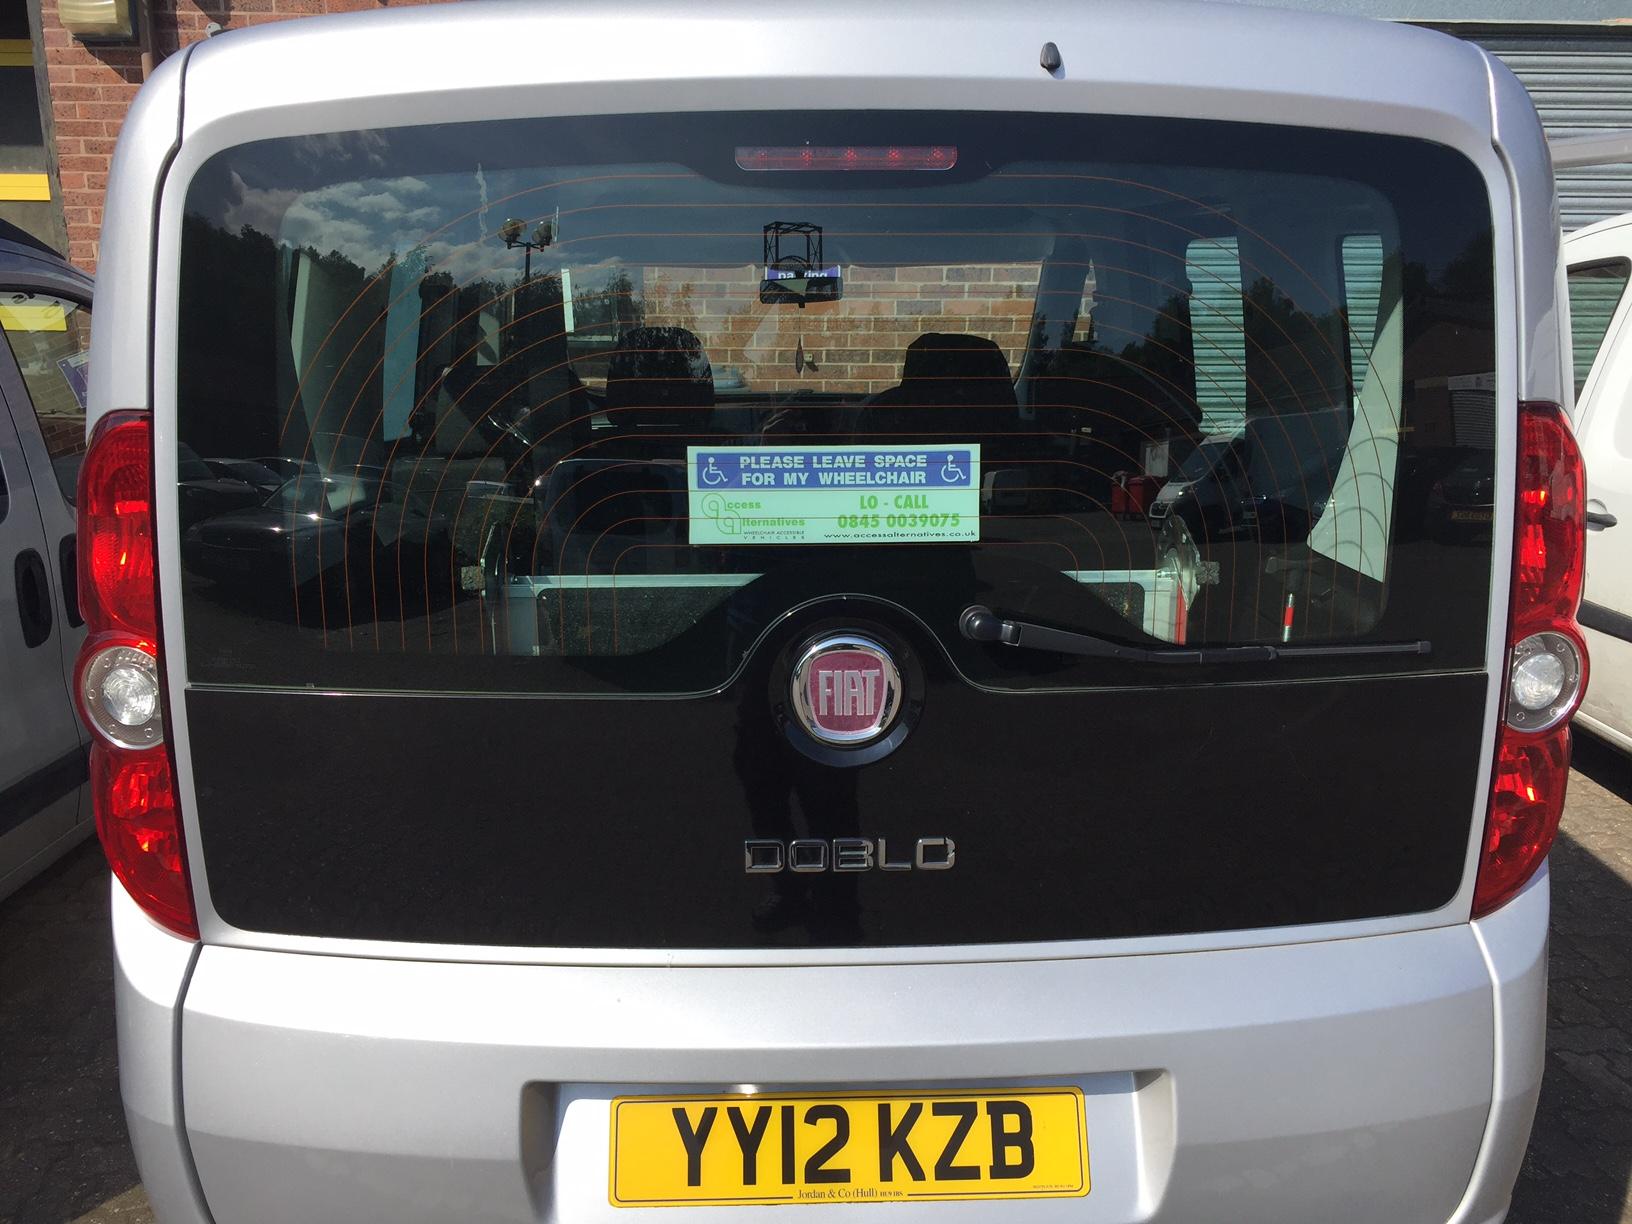 used wheelchair accessible fiat doblo my life 1 4 petrol manual rh accessalternatives co uk Fiat Doblo 4x4 Fiat Doblo Van